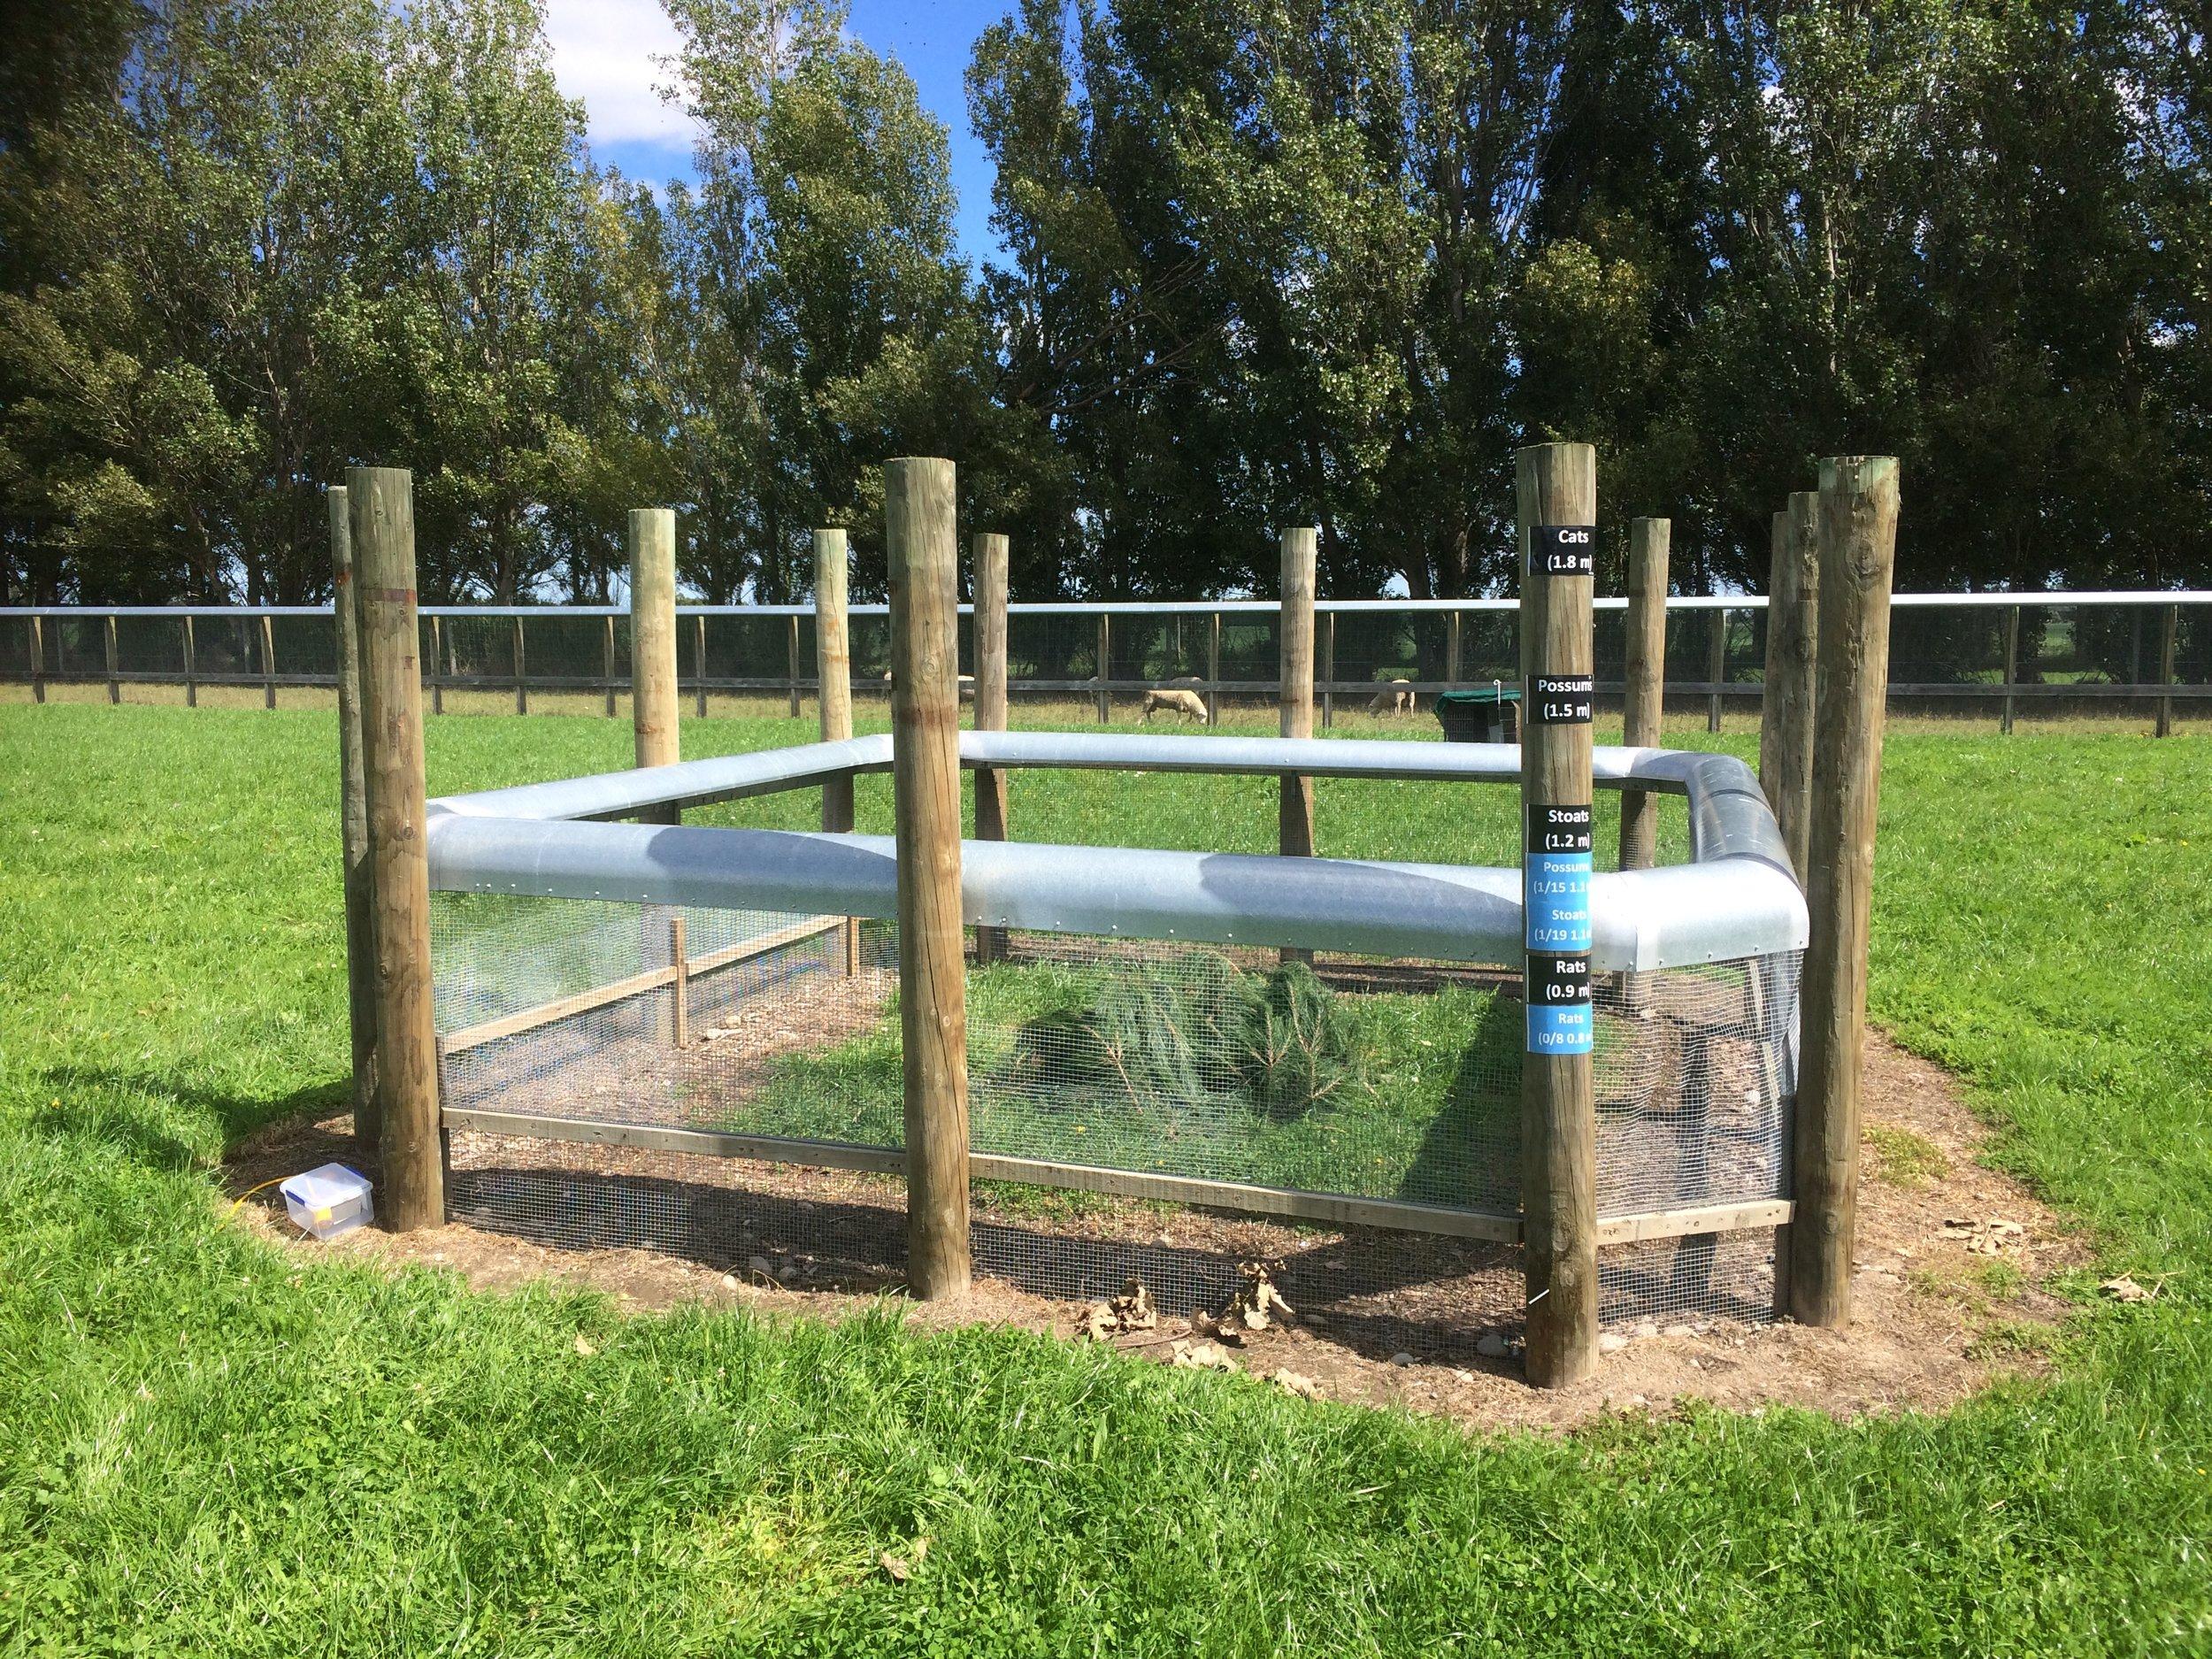 Custom-built 4 x 4 metre testing pen inside ZIP's larger (2 ha) predator-fenced enclosure